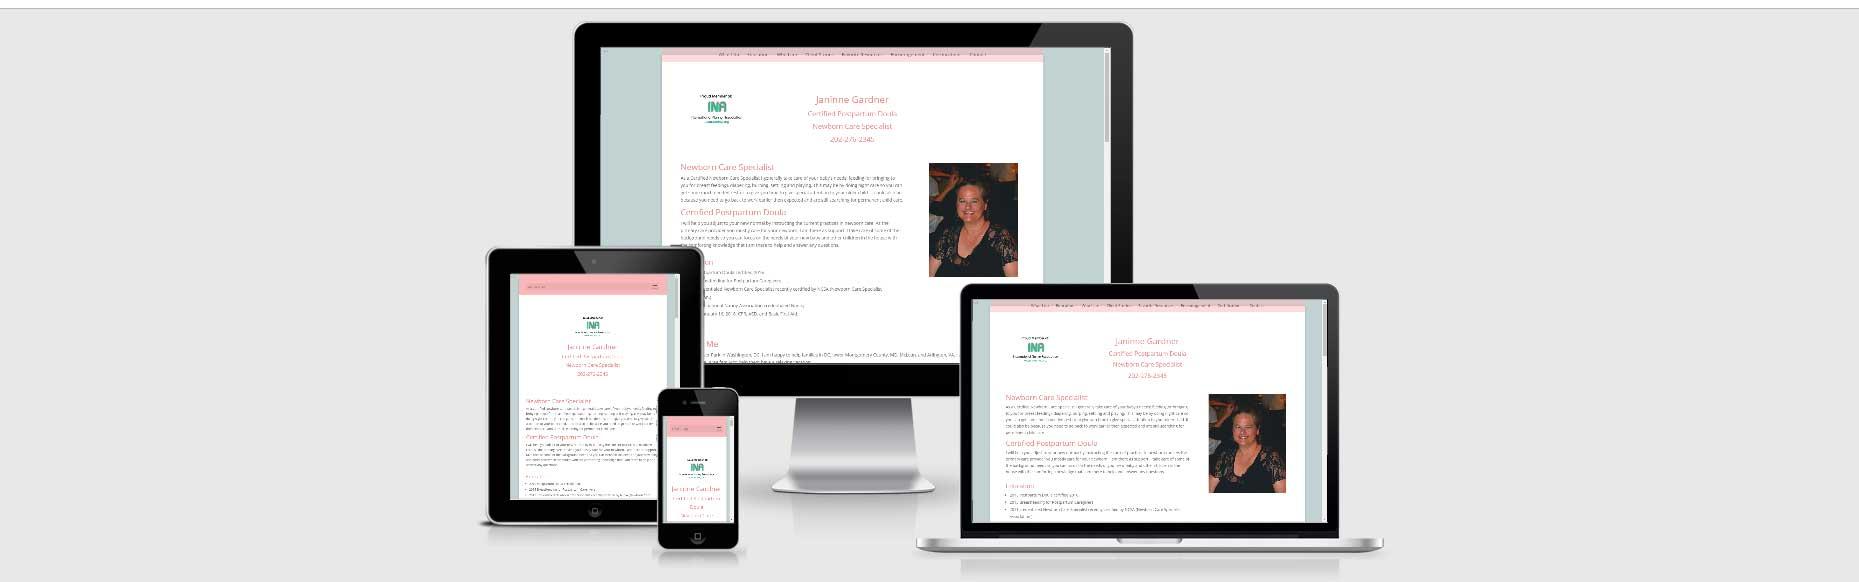 ACI Machine Tool Sales, Inc. Web Design Portfolio